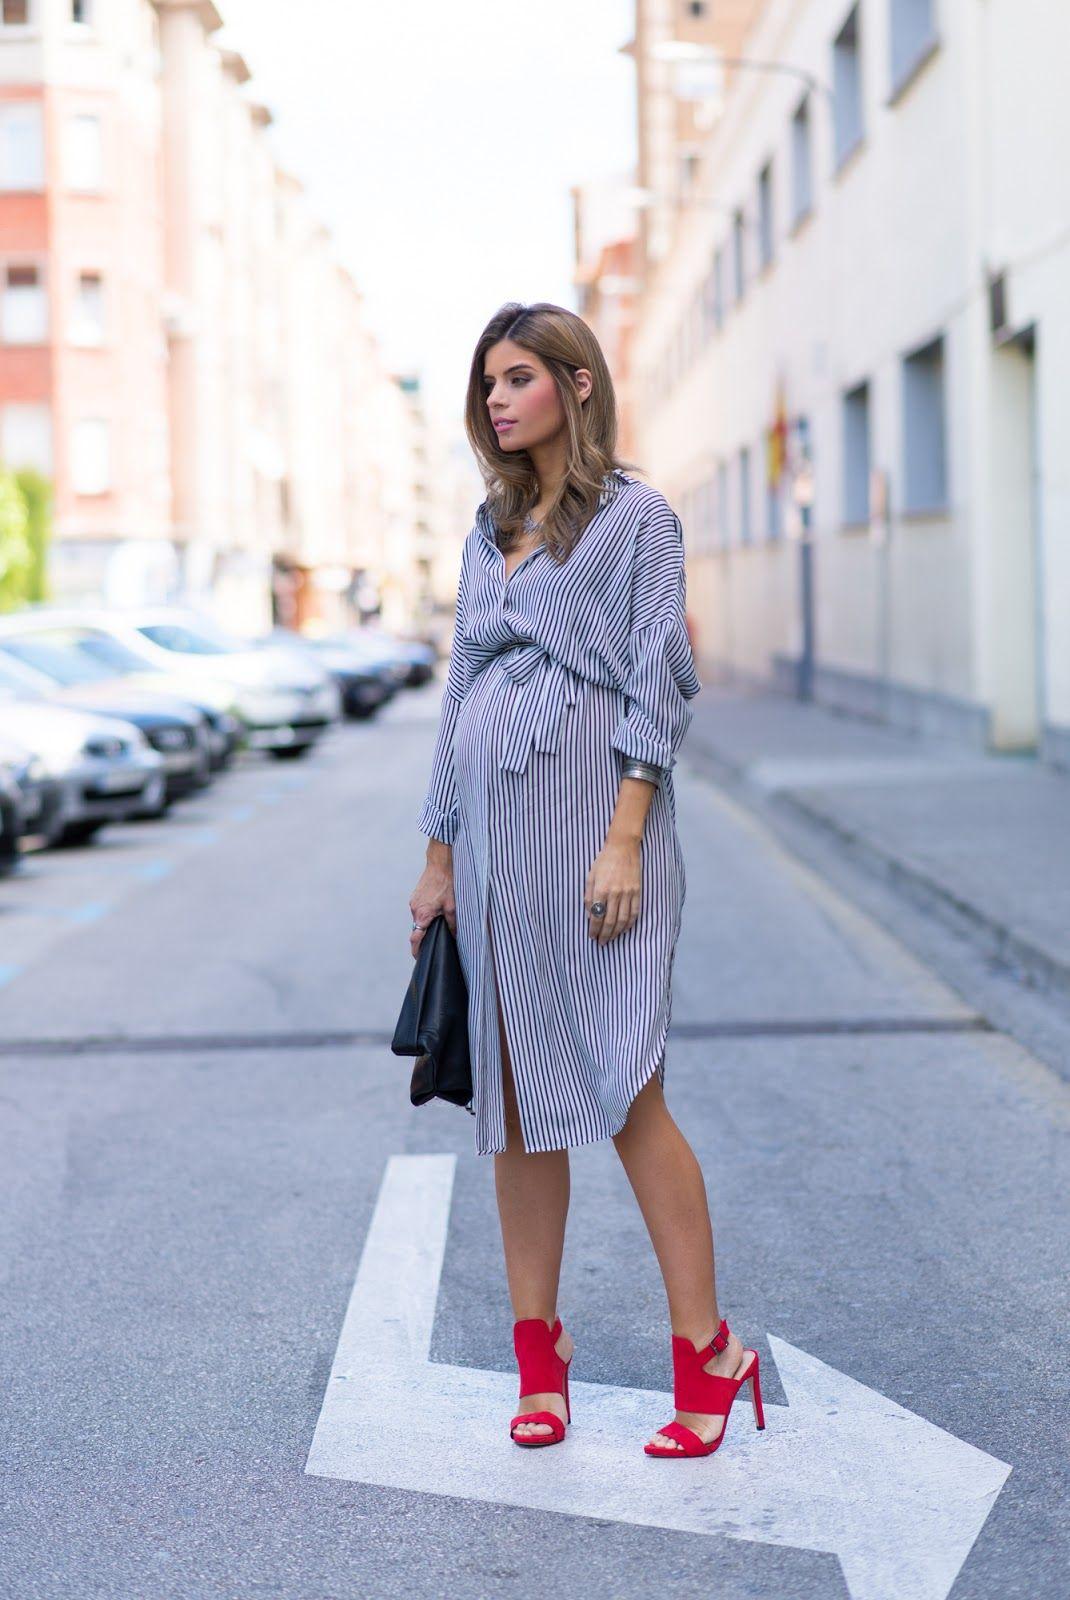 665c99848 Ms Treinta - Blog de moda y tendencias by Alba. - Fashion Blogger -  33  weeks  Shirt Dress